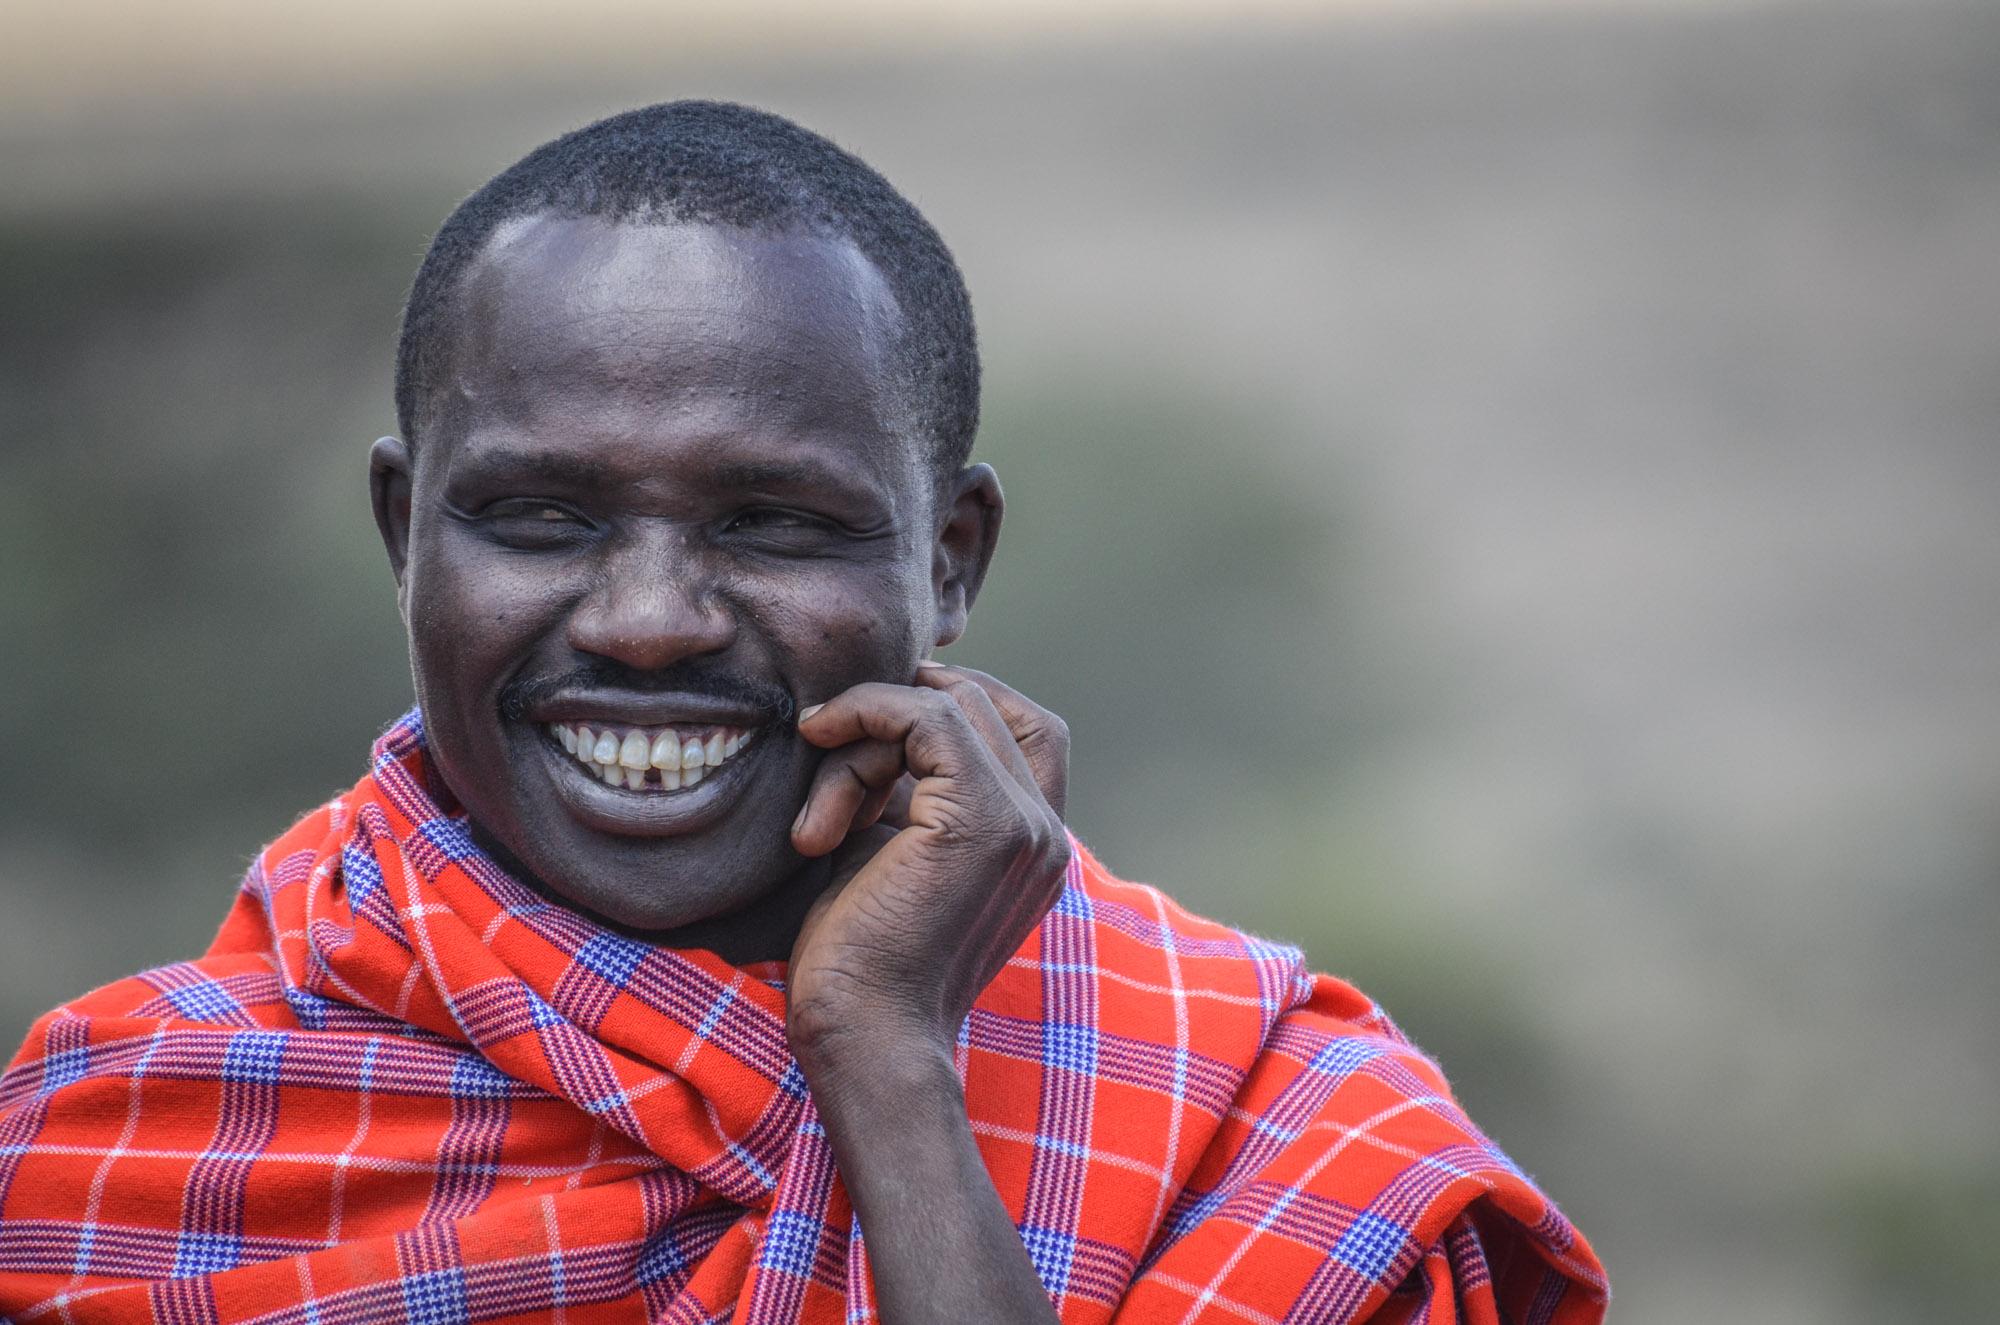 escari-maasai-we-kenya-portrait-2011-10-21.jpg